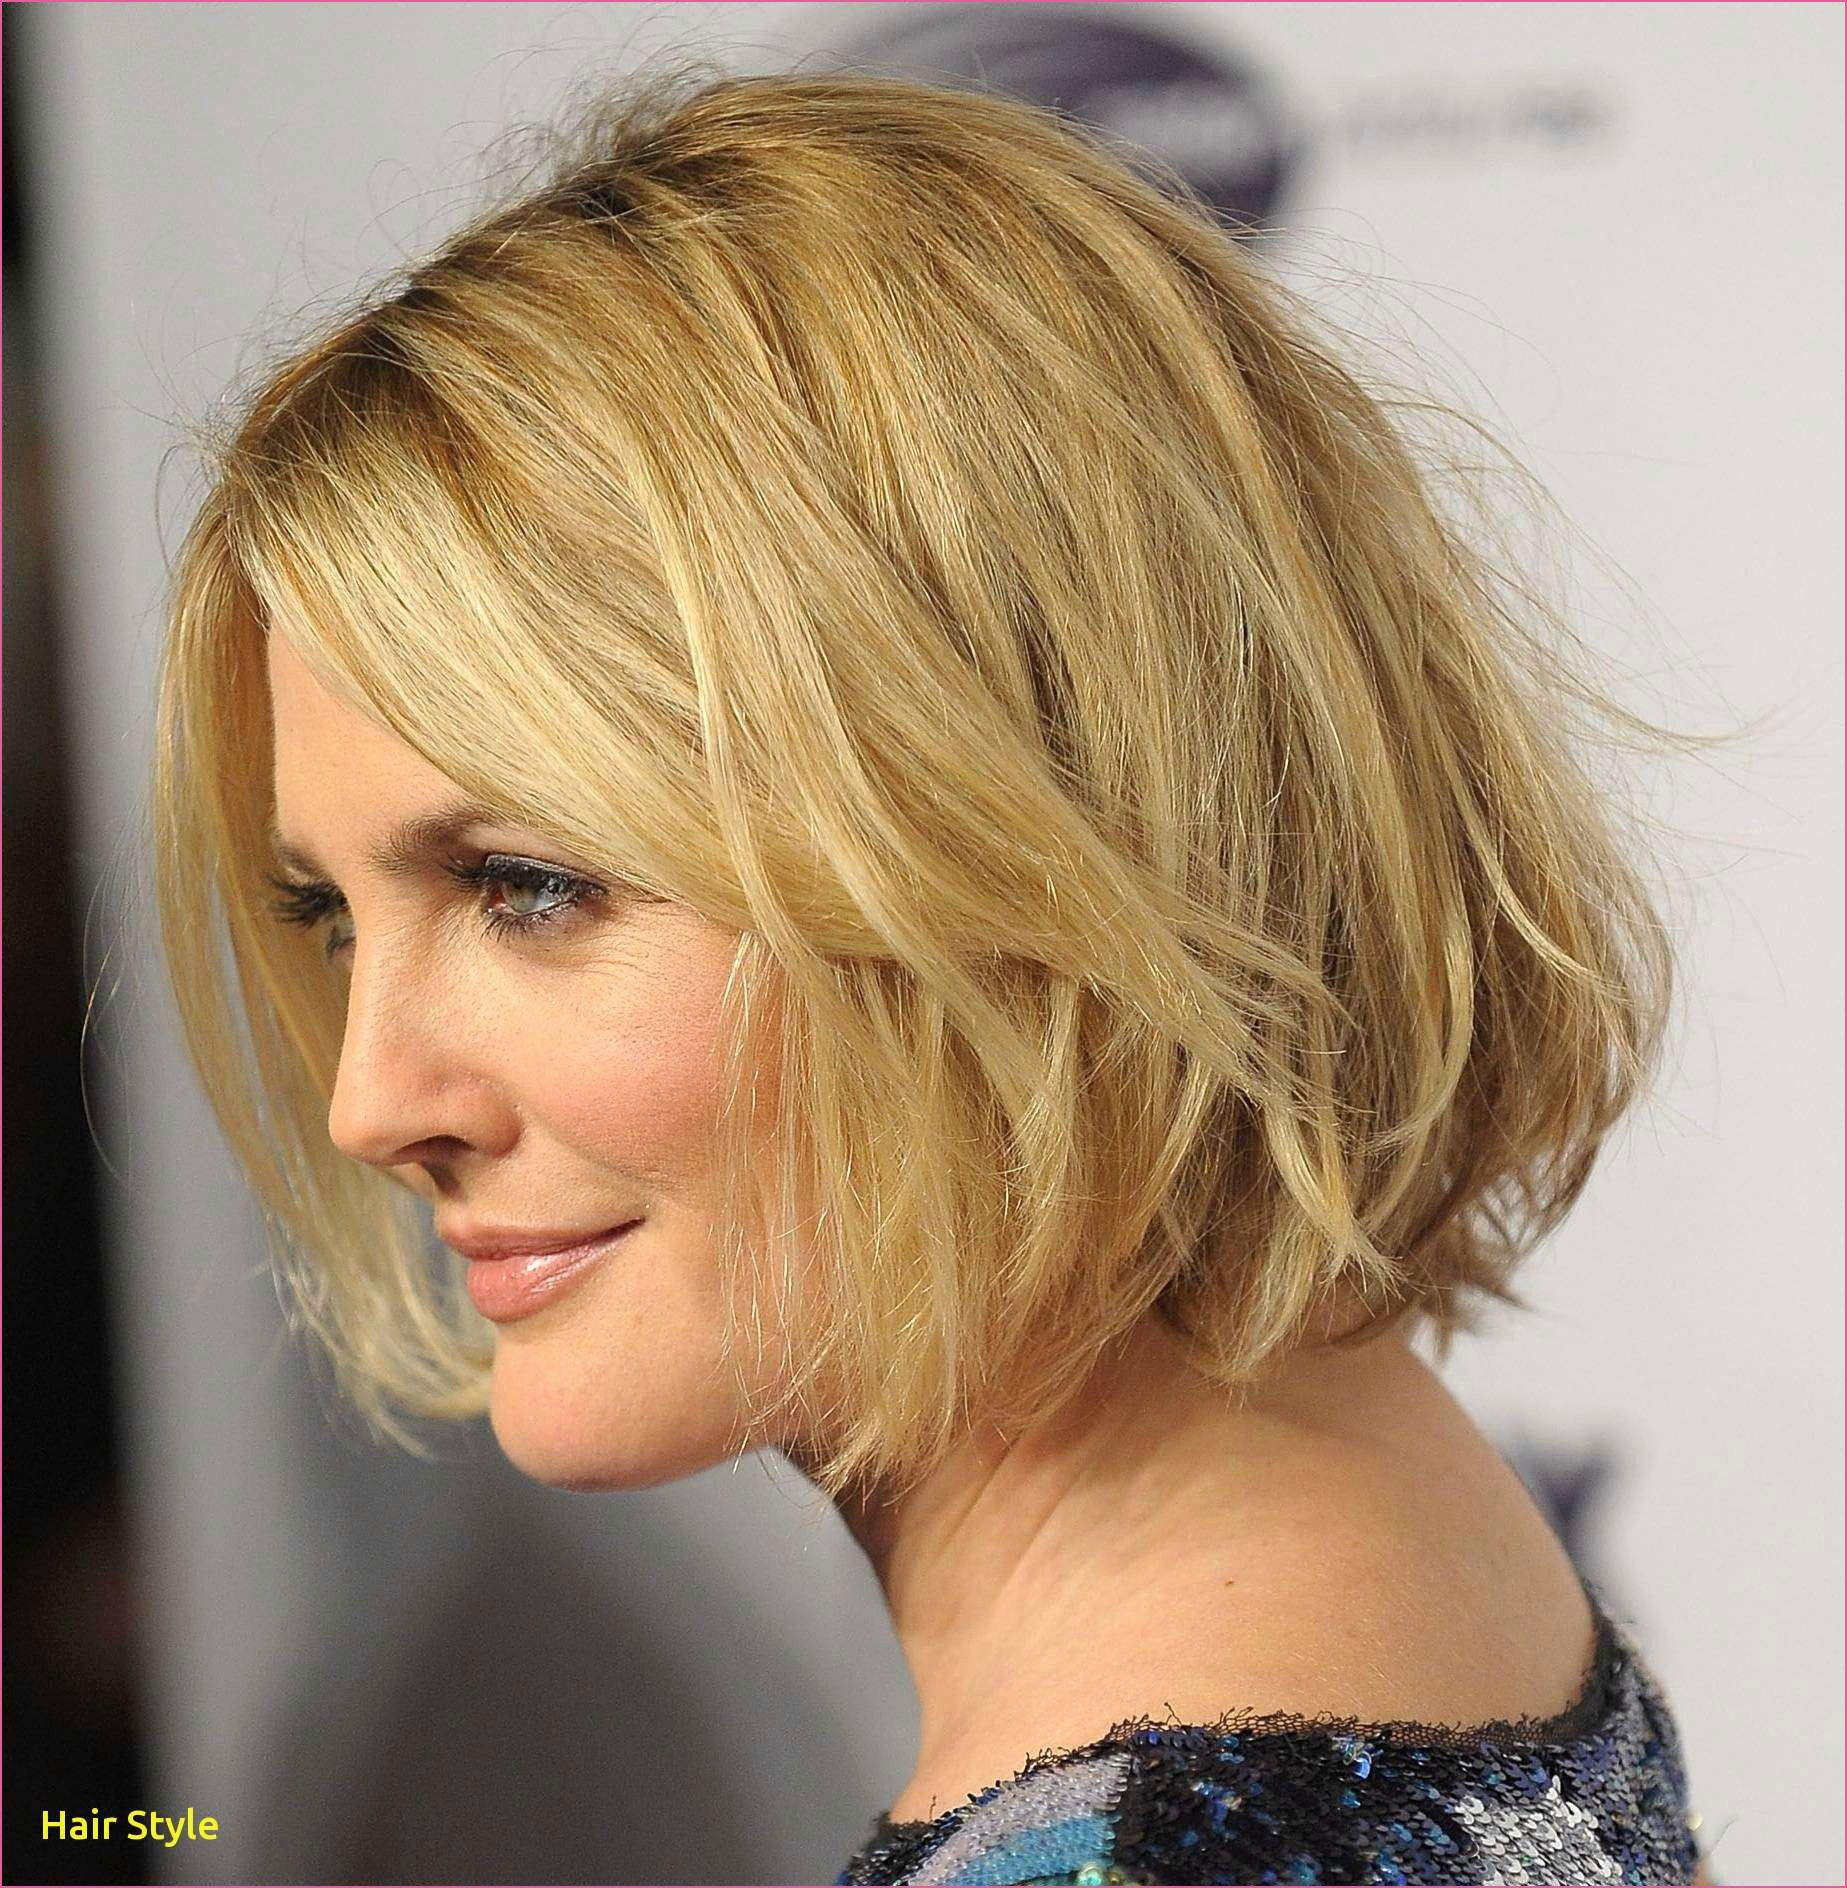 fein Haarschnitt Frauen 12 in 12  Kurzhaarfrisuren, Bob